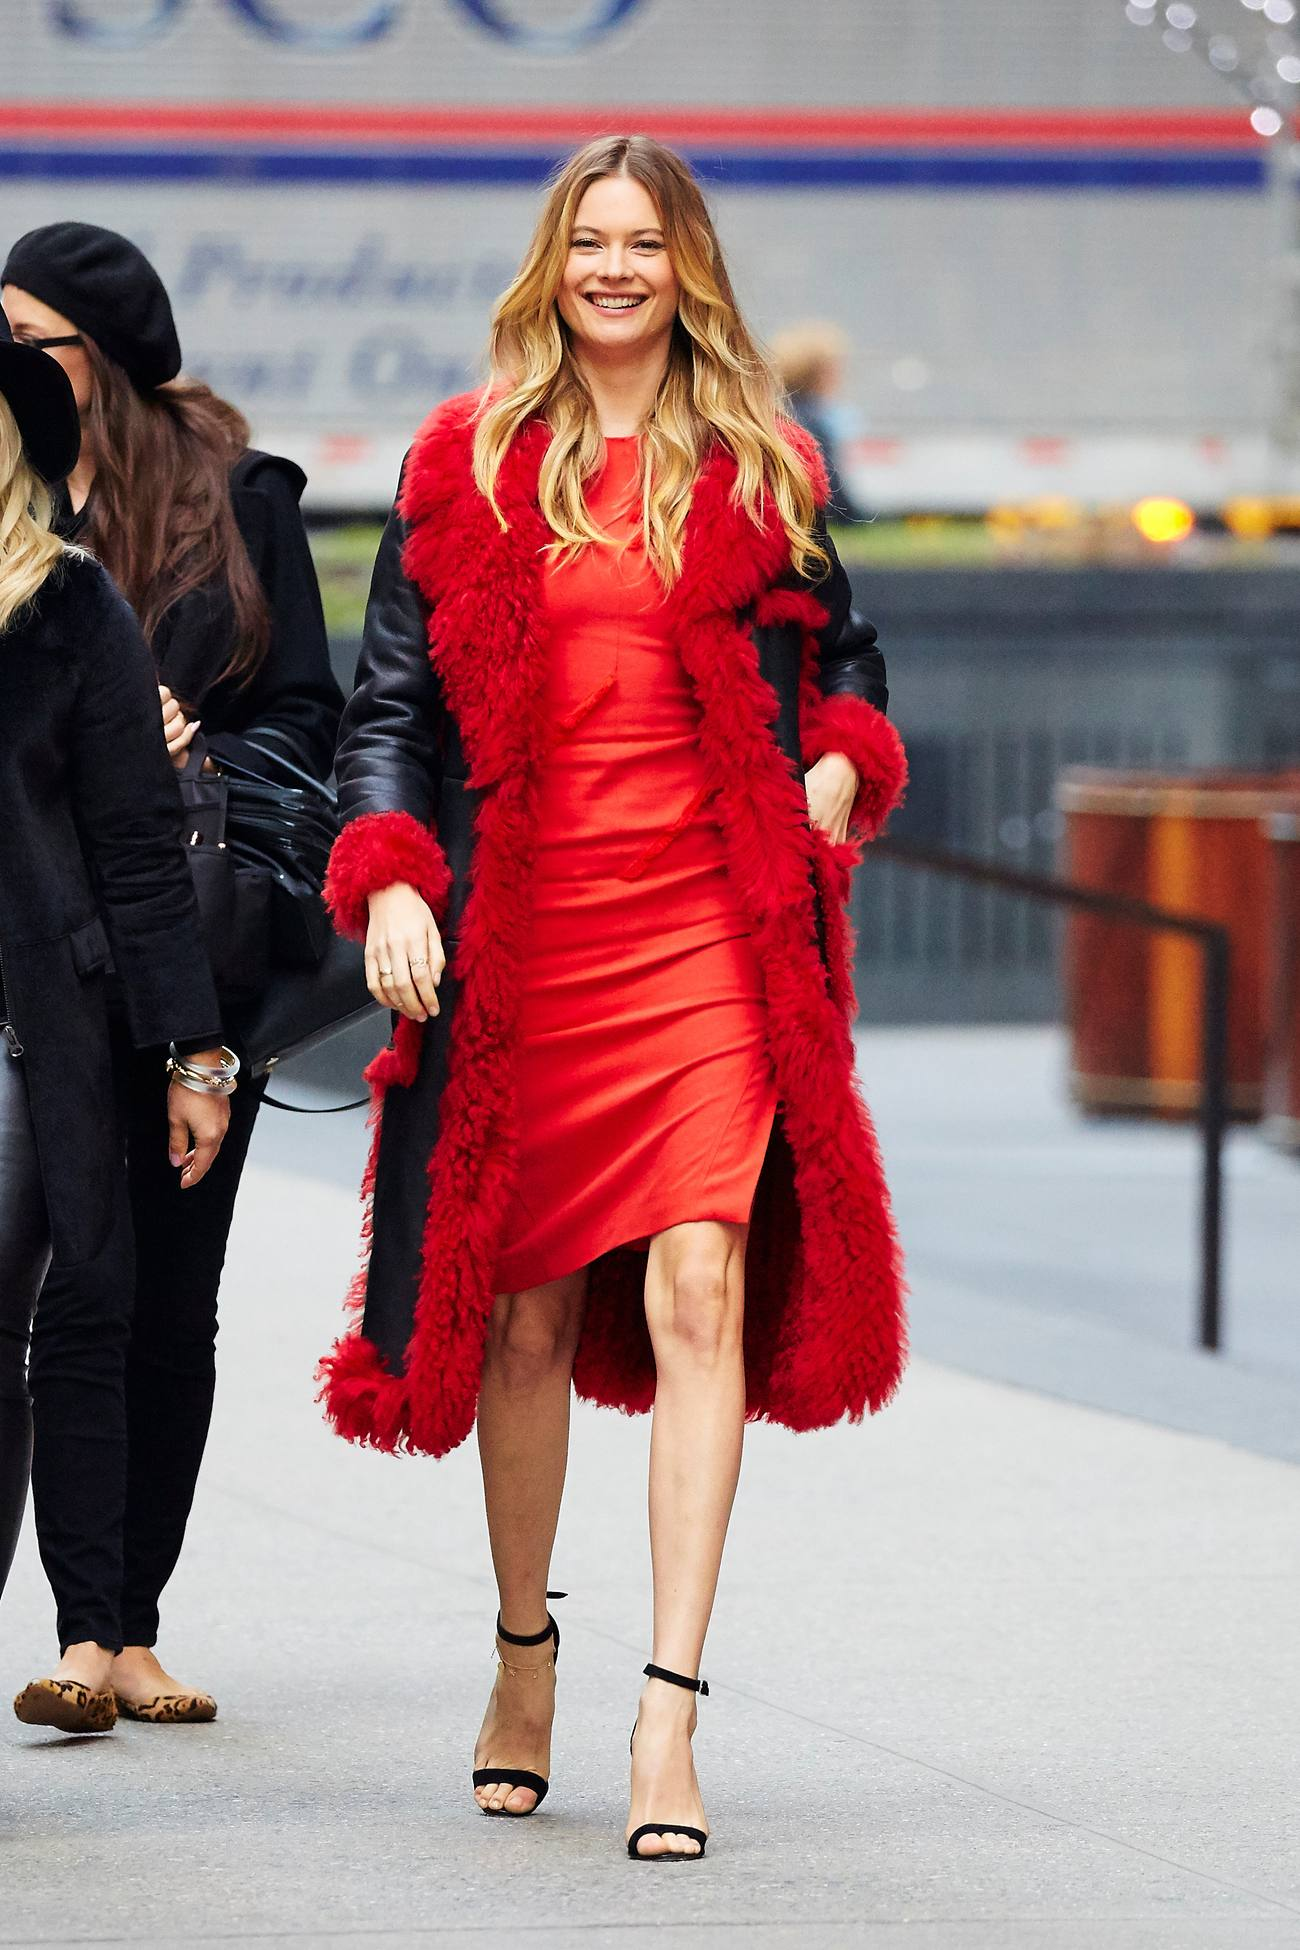 Behati Prinsloo Red Beauty in NYC-3